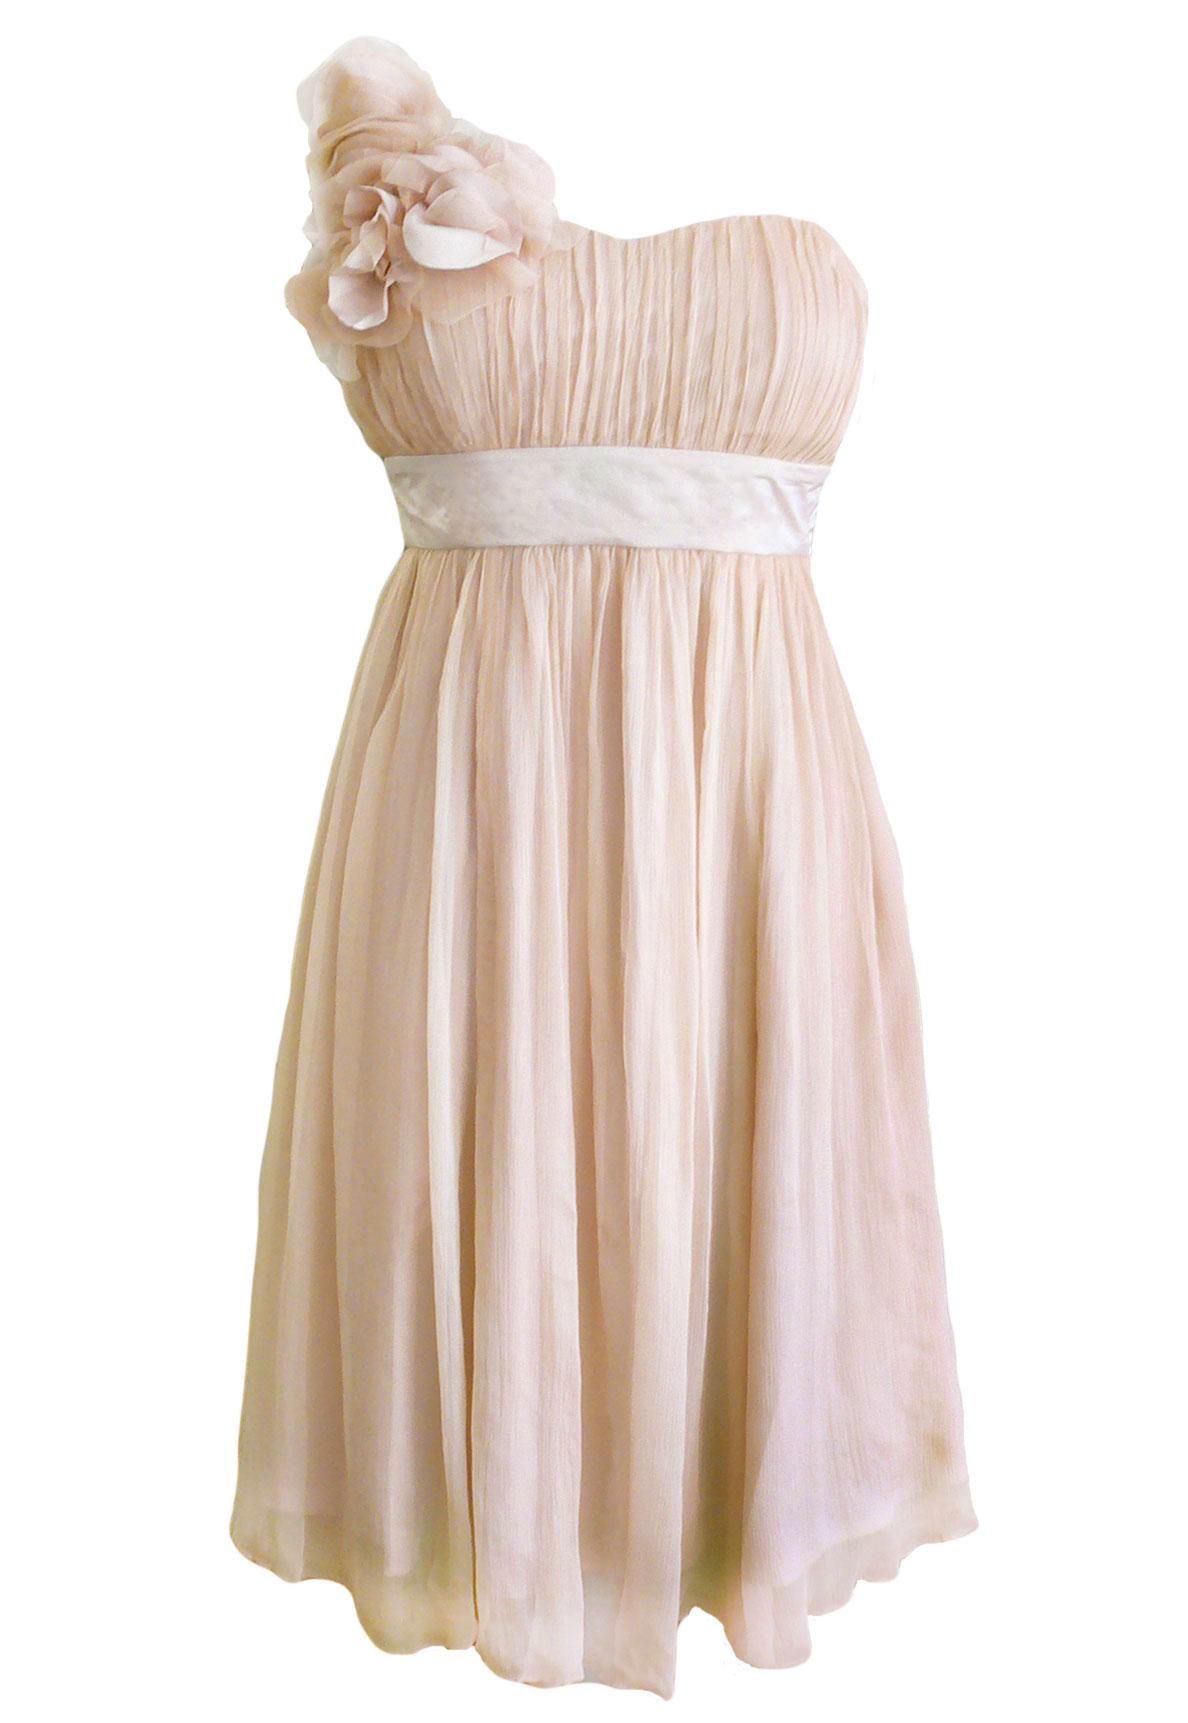 Fever London Ivy Seiden Kleid nude M-XL